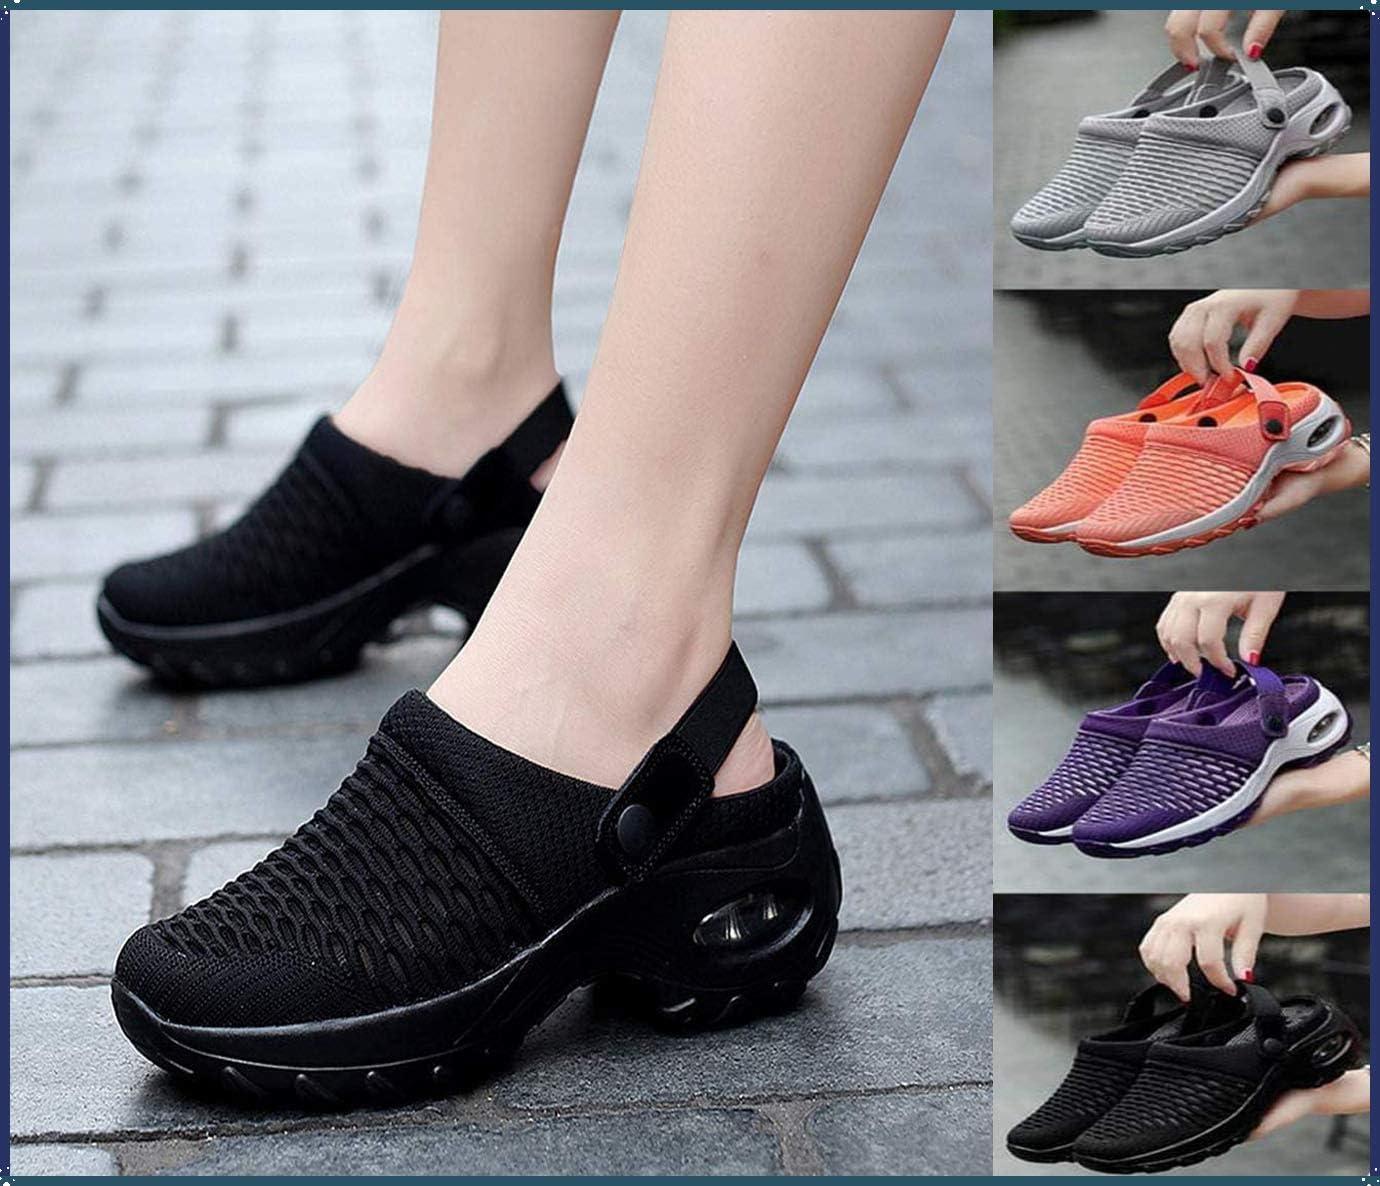 QASW Women's Breathable Casual air Cushion Slip-on Shoes, Mesh Slip On Air Cushion Garden Shoes Summer Platform Mesh Mules Sneaker Sandals Orthopedic Walking Sandals